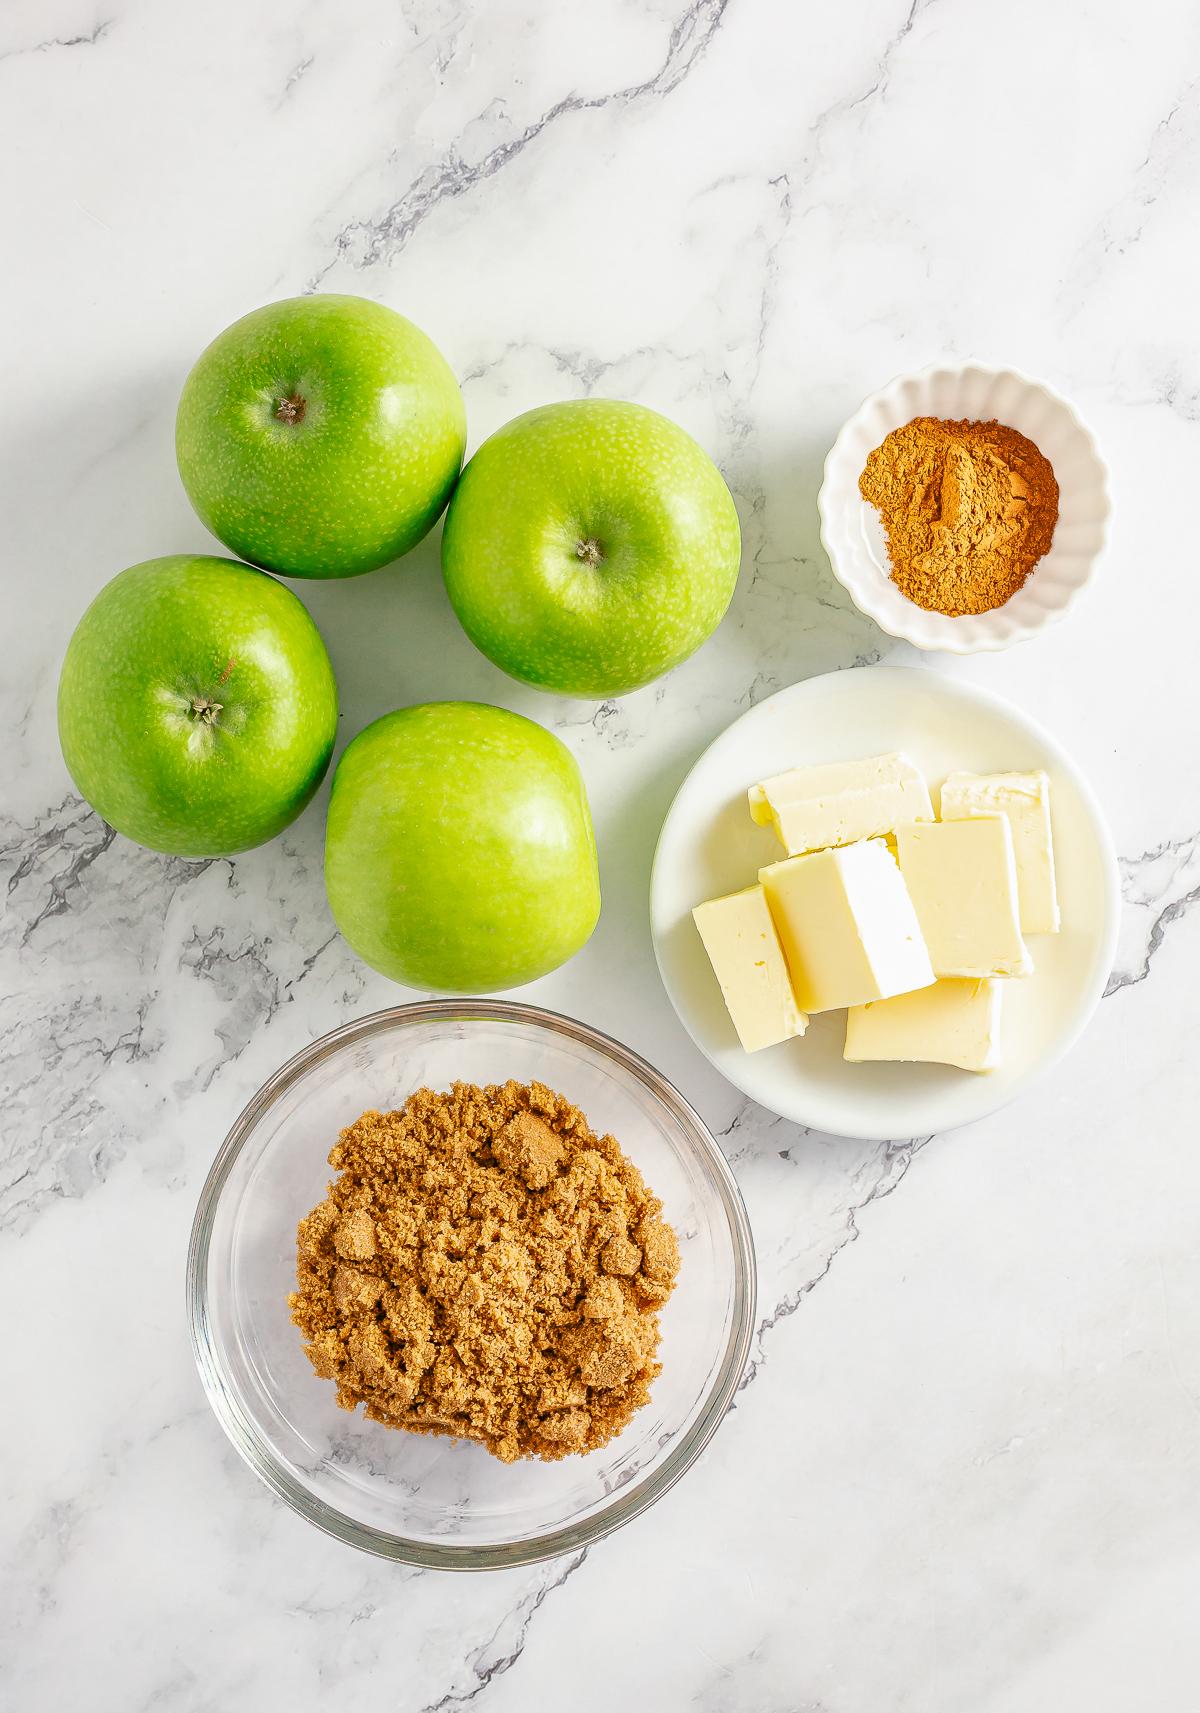 Ingredients needed to make Fried Apples.